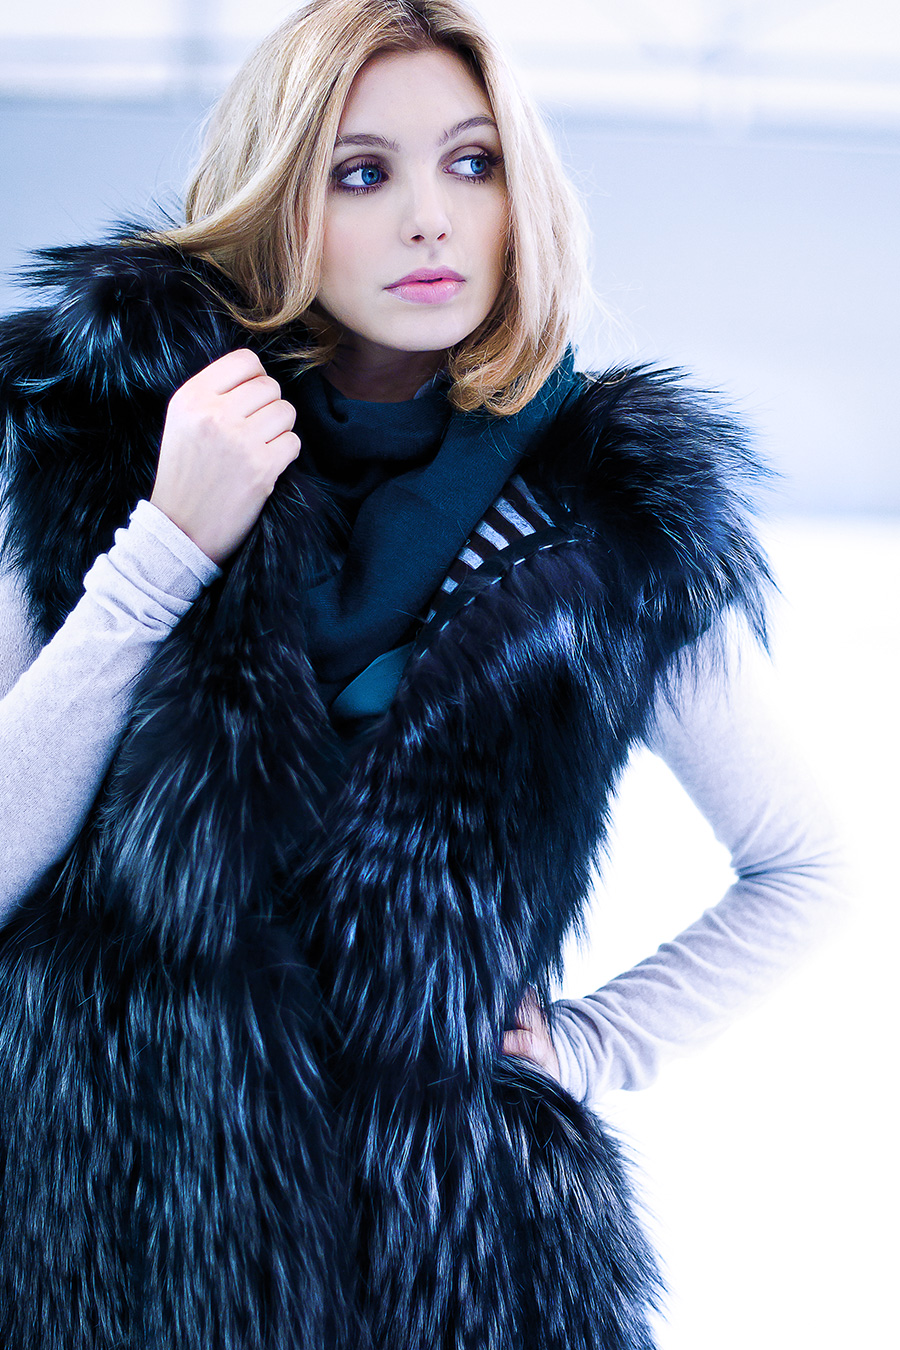 Fashion Editorial - Ice